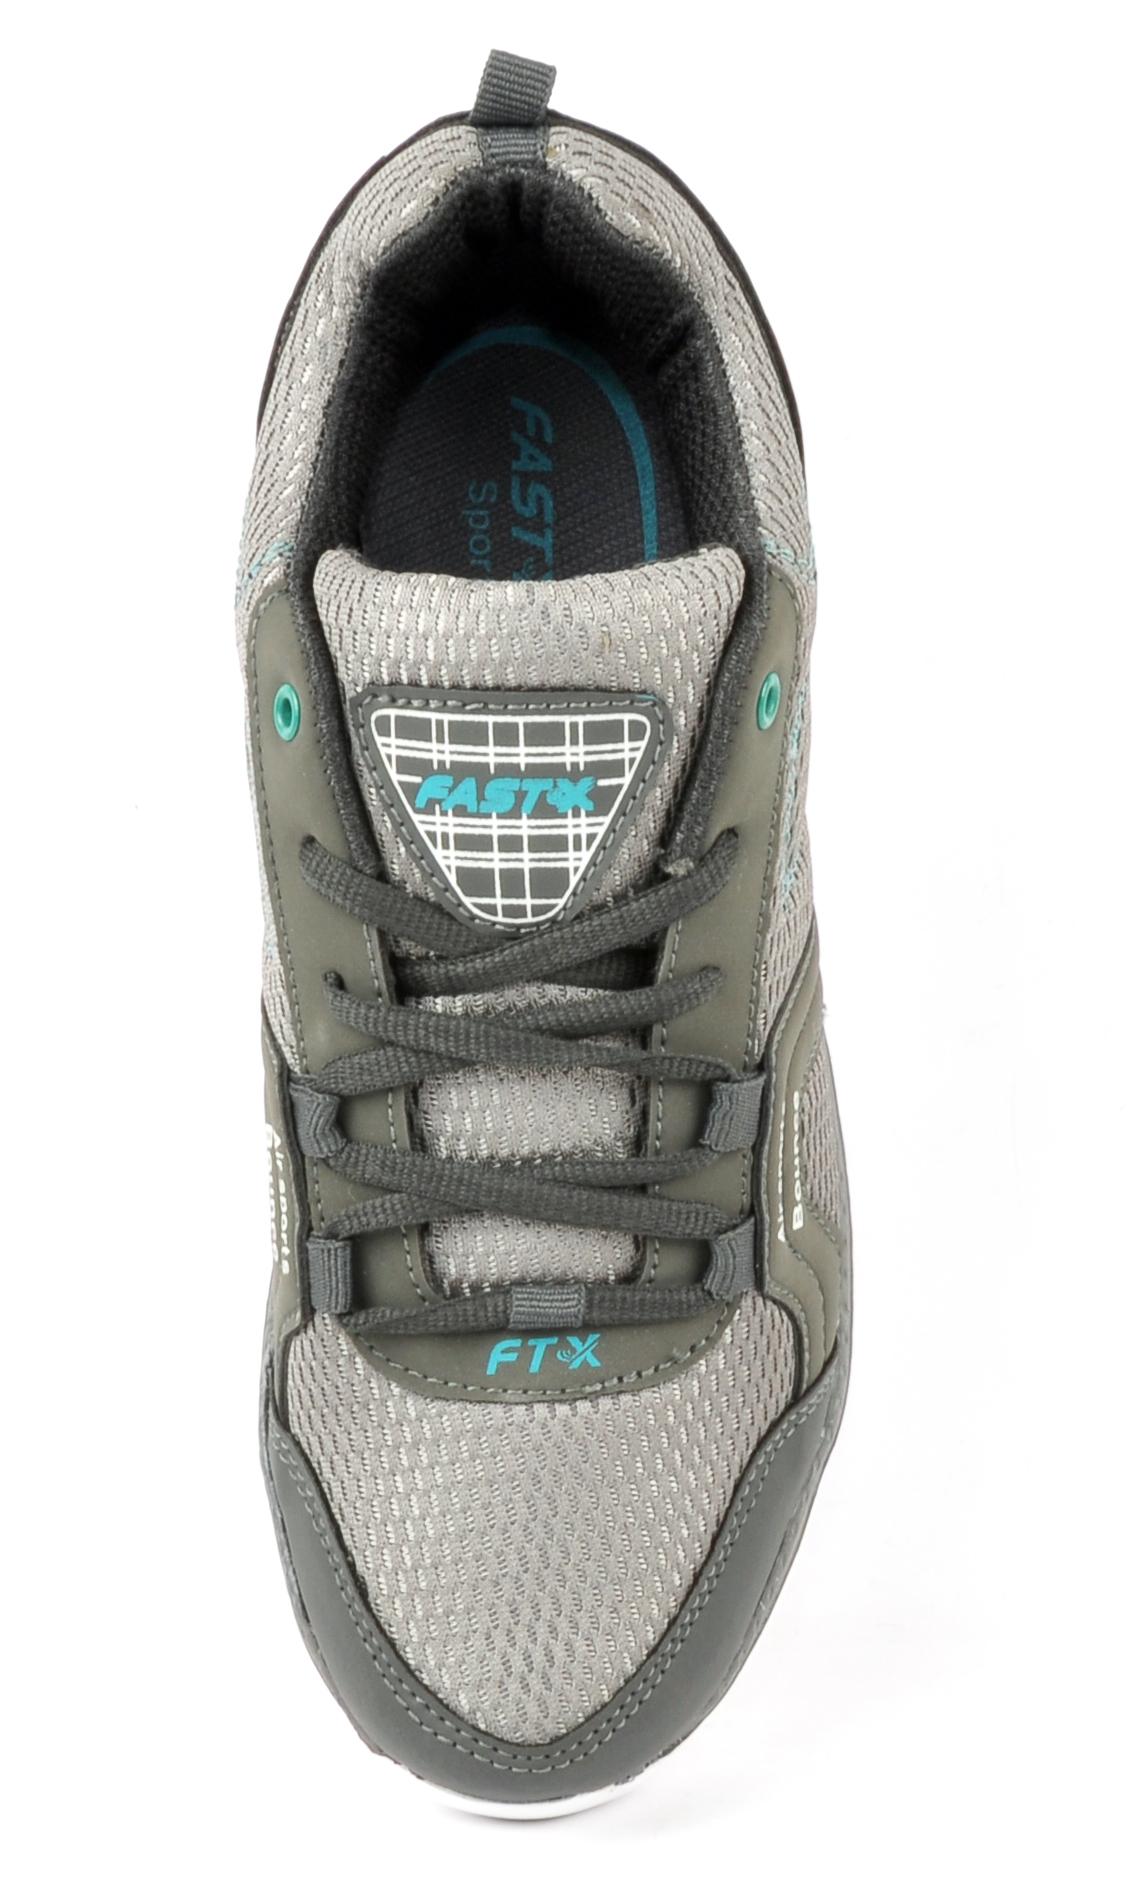 Fastx Sports Shoes